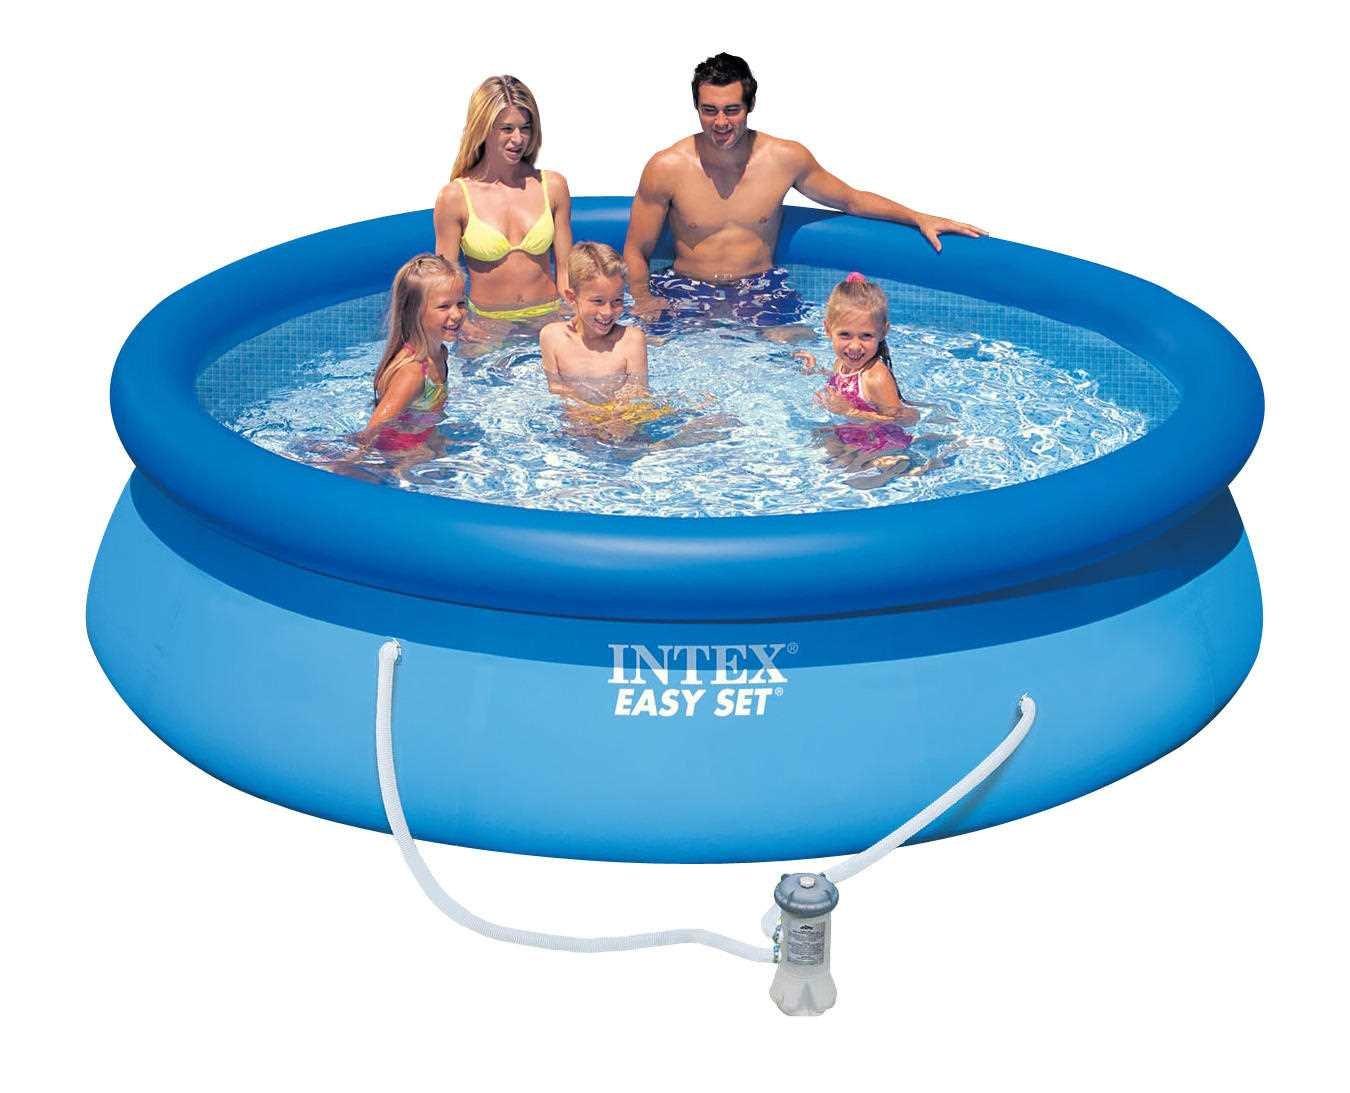 Fantastisk Intex Easy Set Pool 305cm inkl. filter og pumpe (28122) | MIDhobby.dk QF62